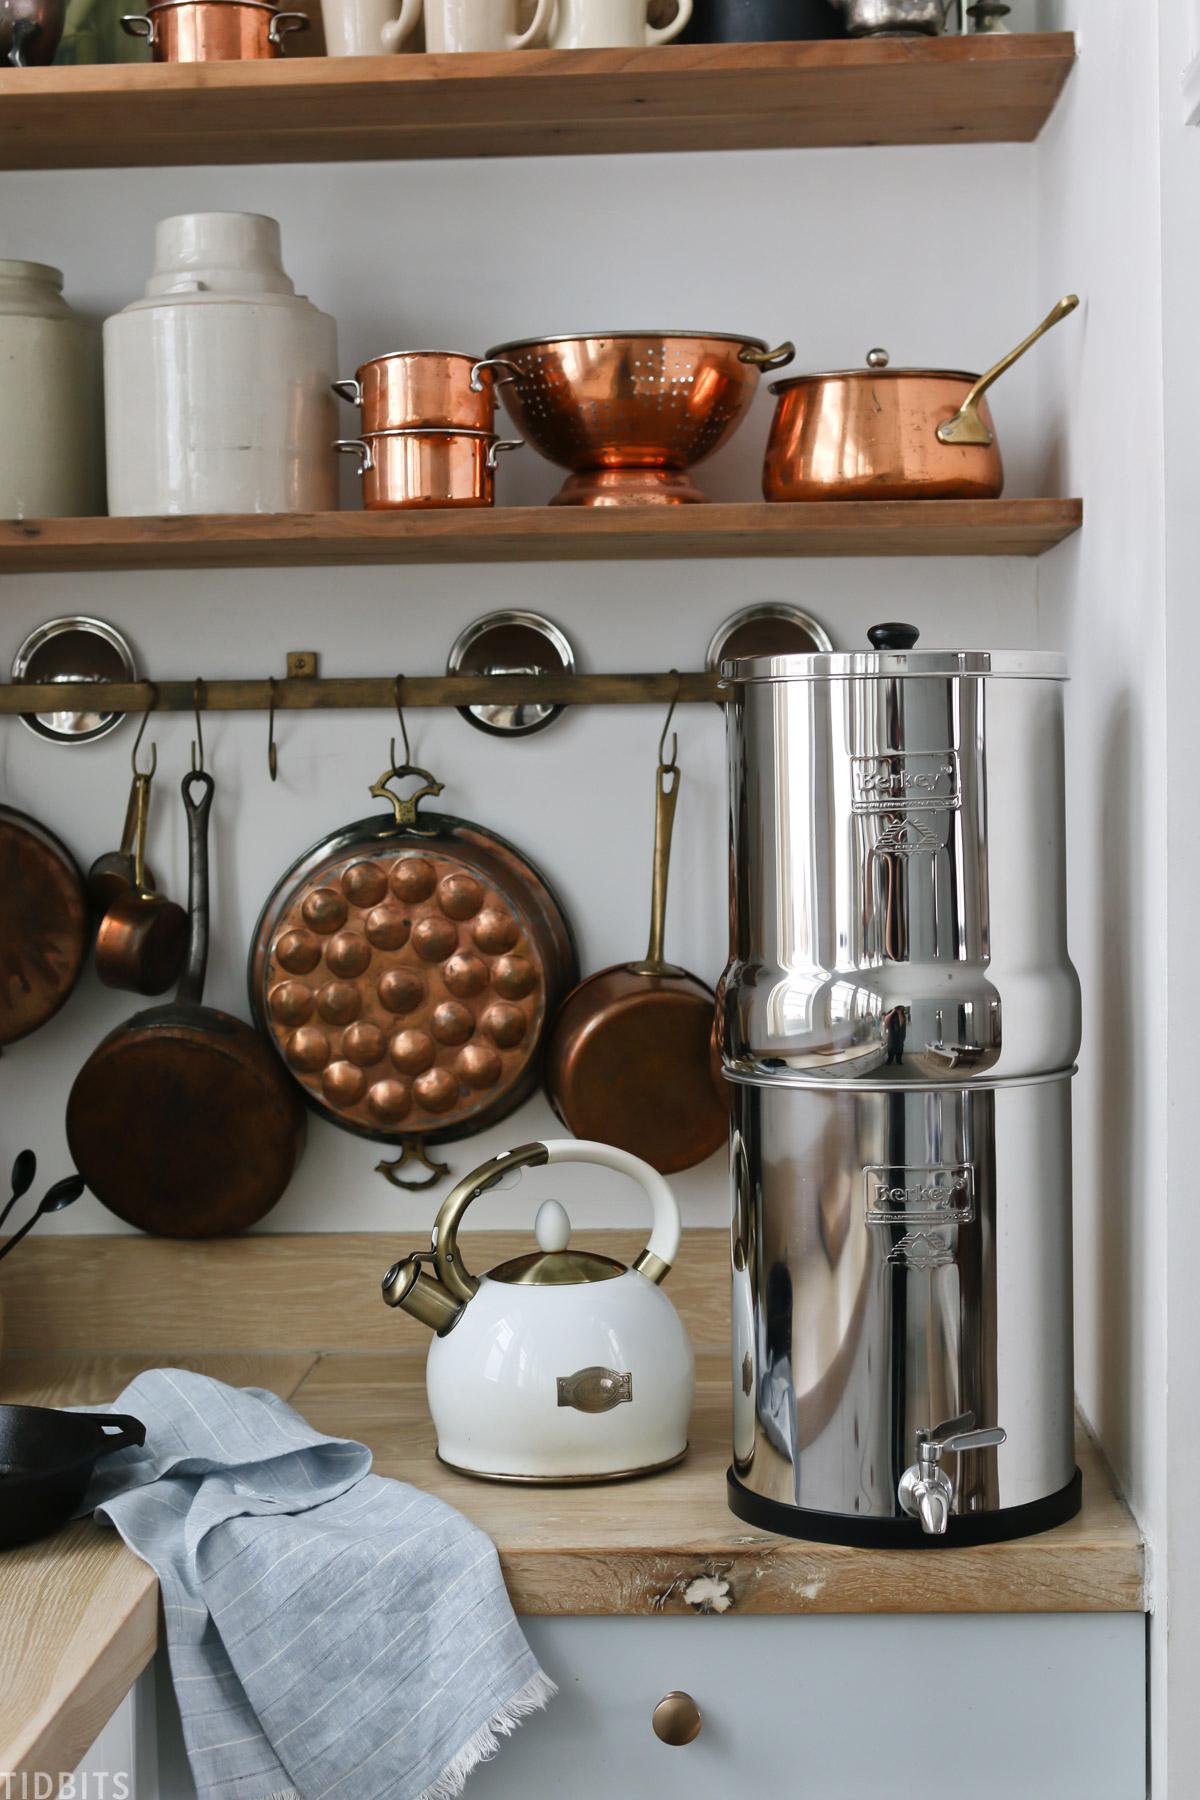 water filter on kitchen countertop next to tea pot